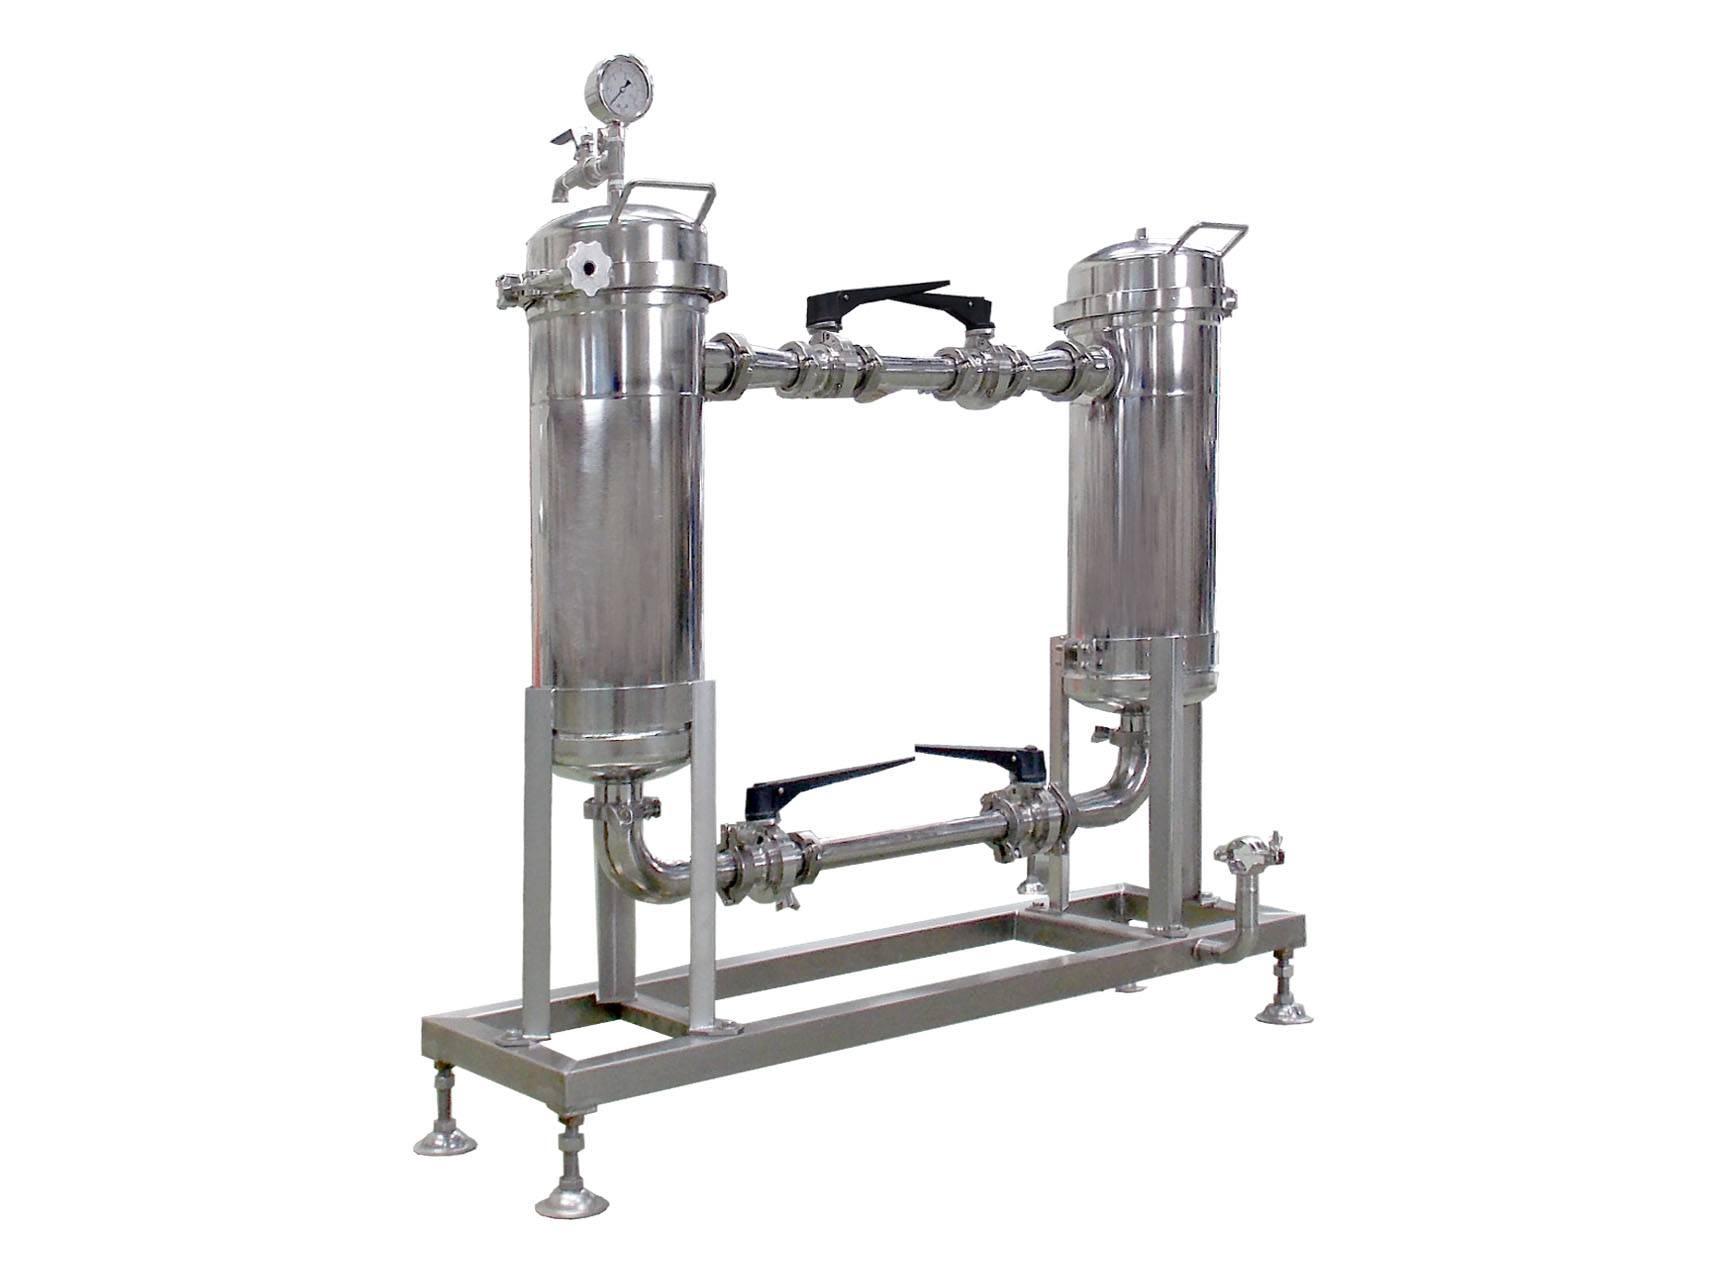 Sojamelkfilter - sojamælk Filter